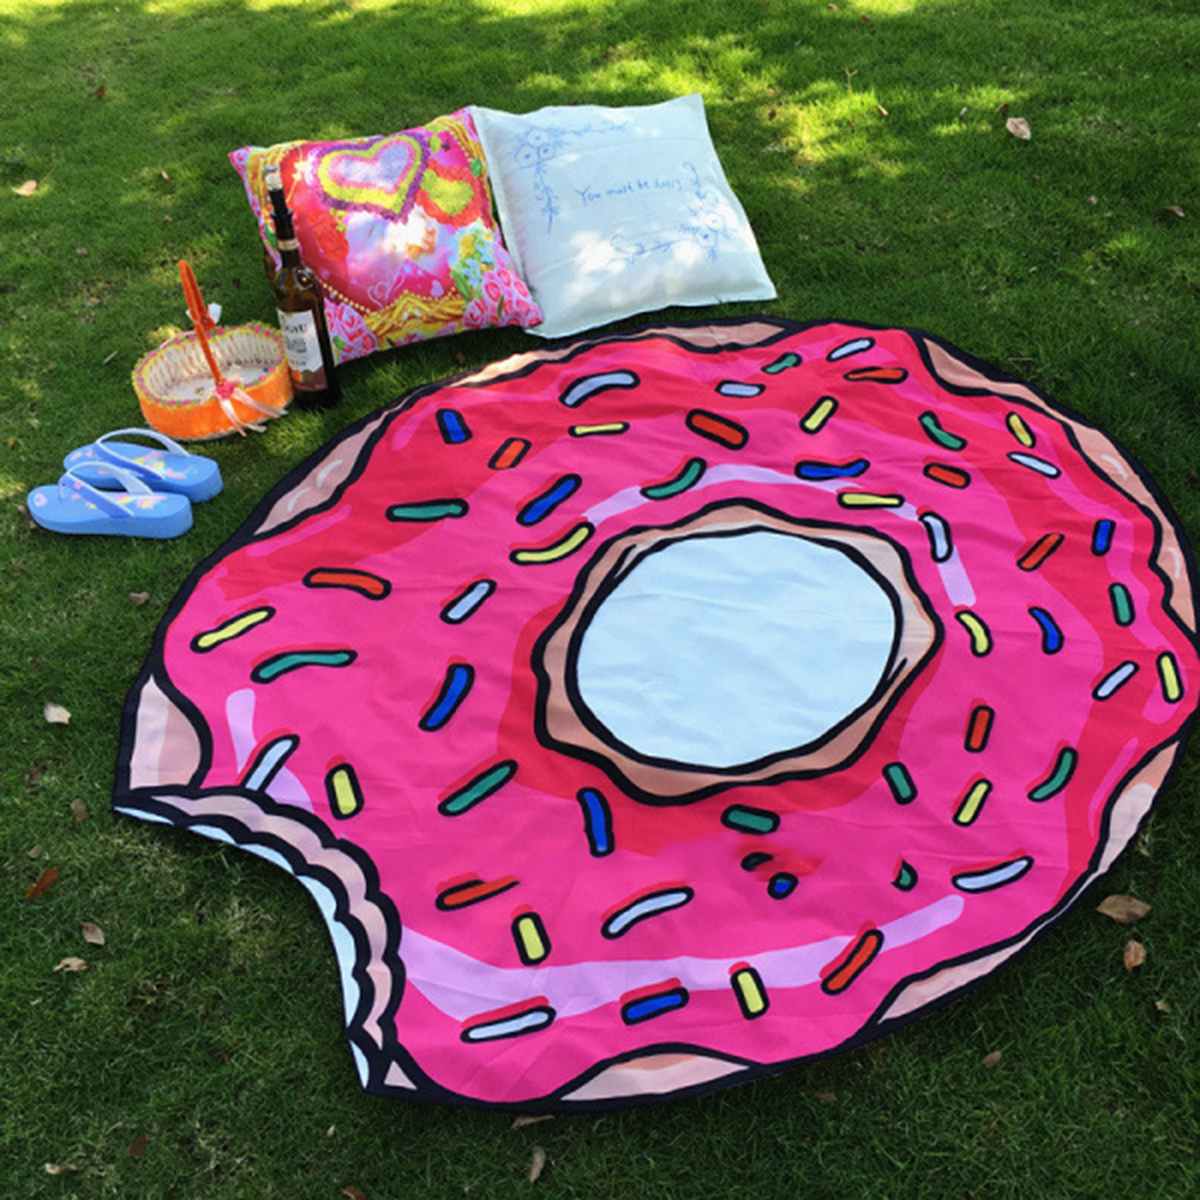 Yoga Mat Beach Blanket Food Pattern Round Throw Beach Towel Sunscreen Shawl Tapestry Wall Hanging